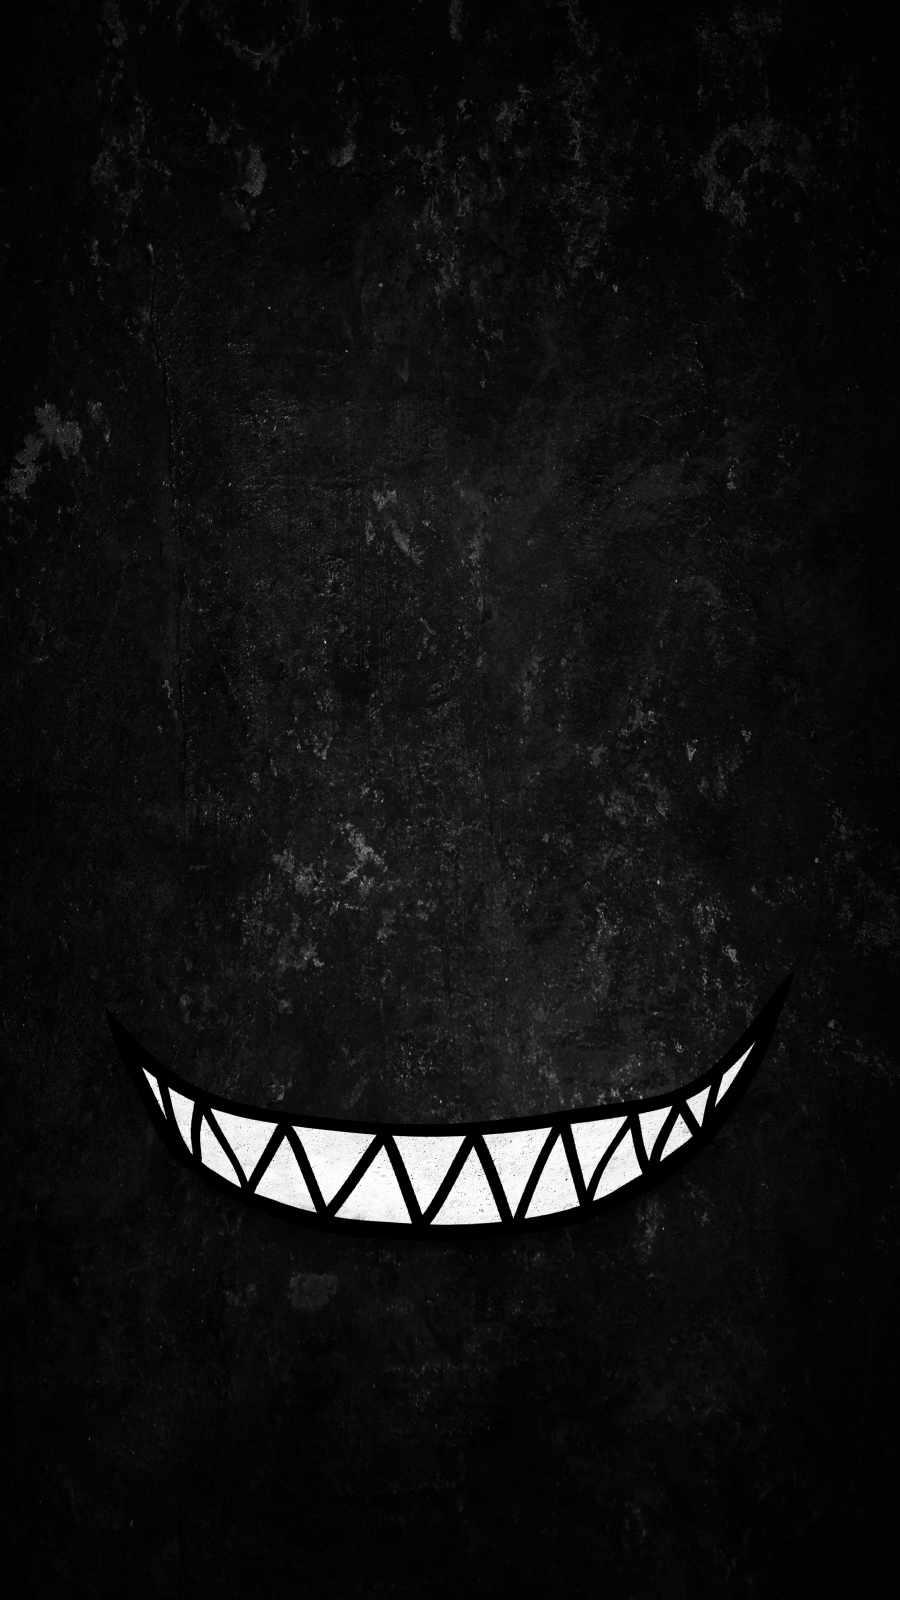 Phone Smile iPhone Wallpaper